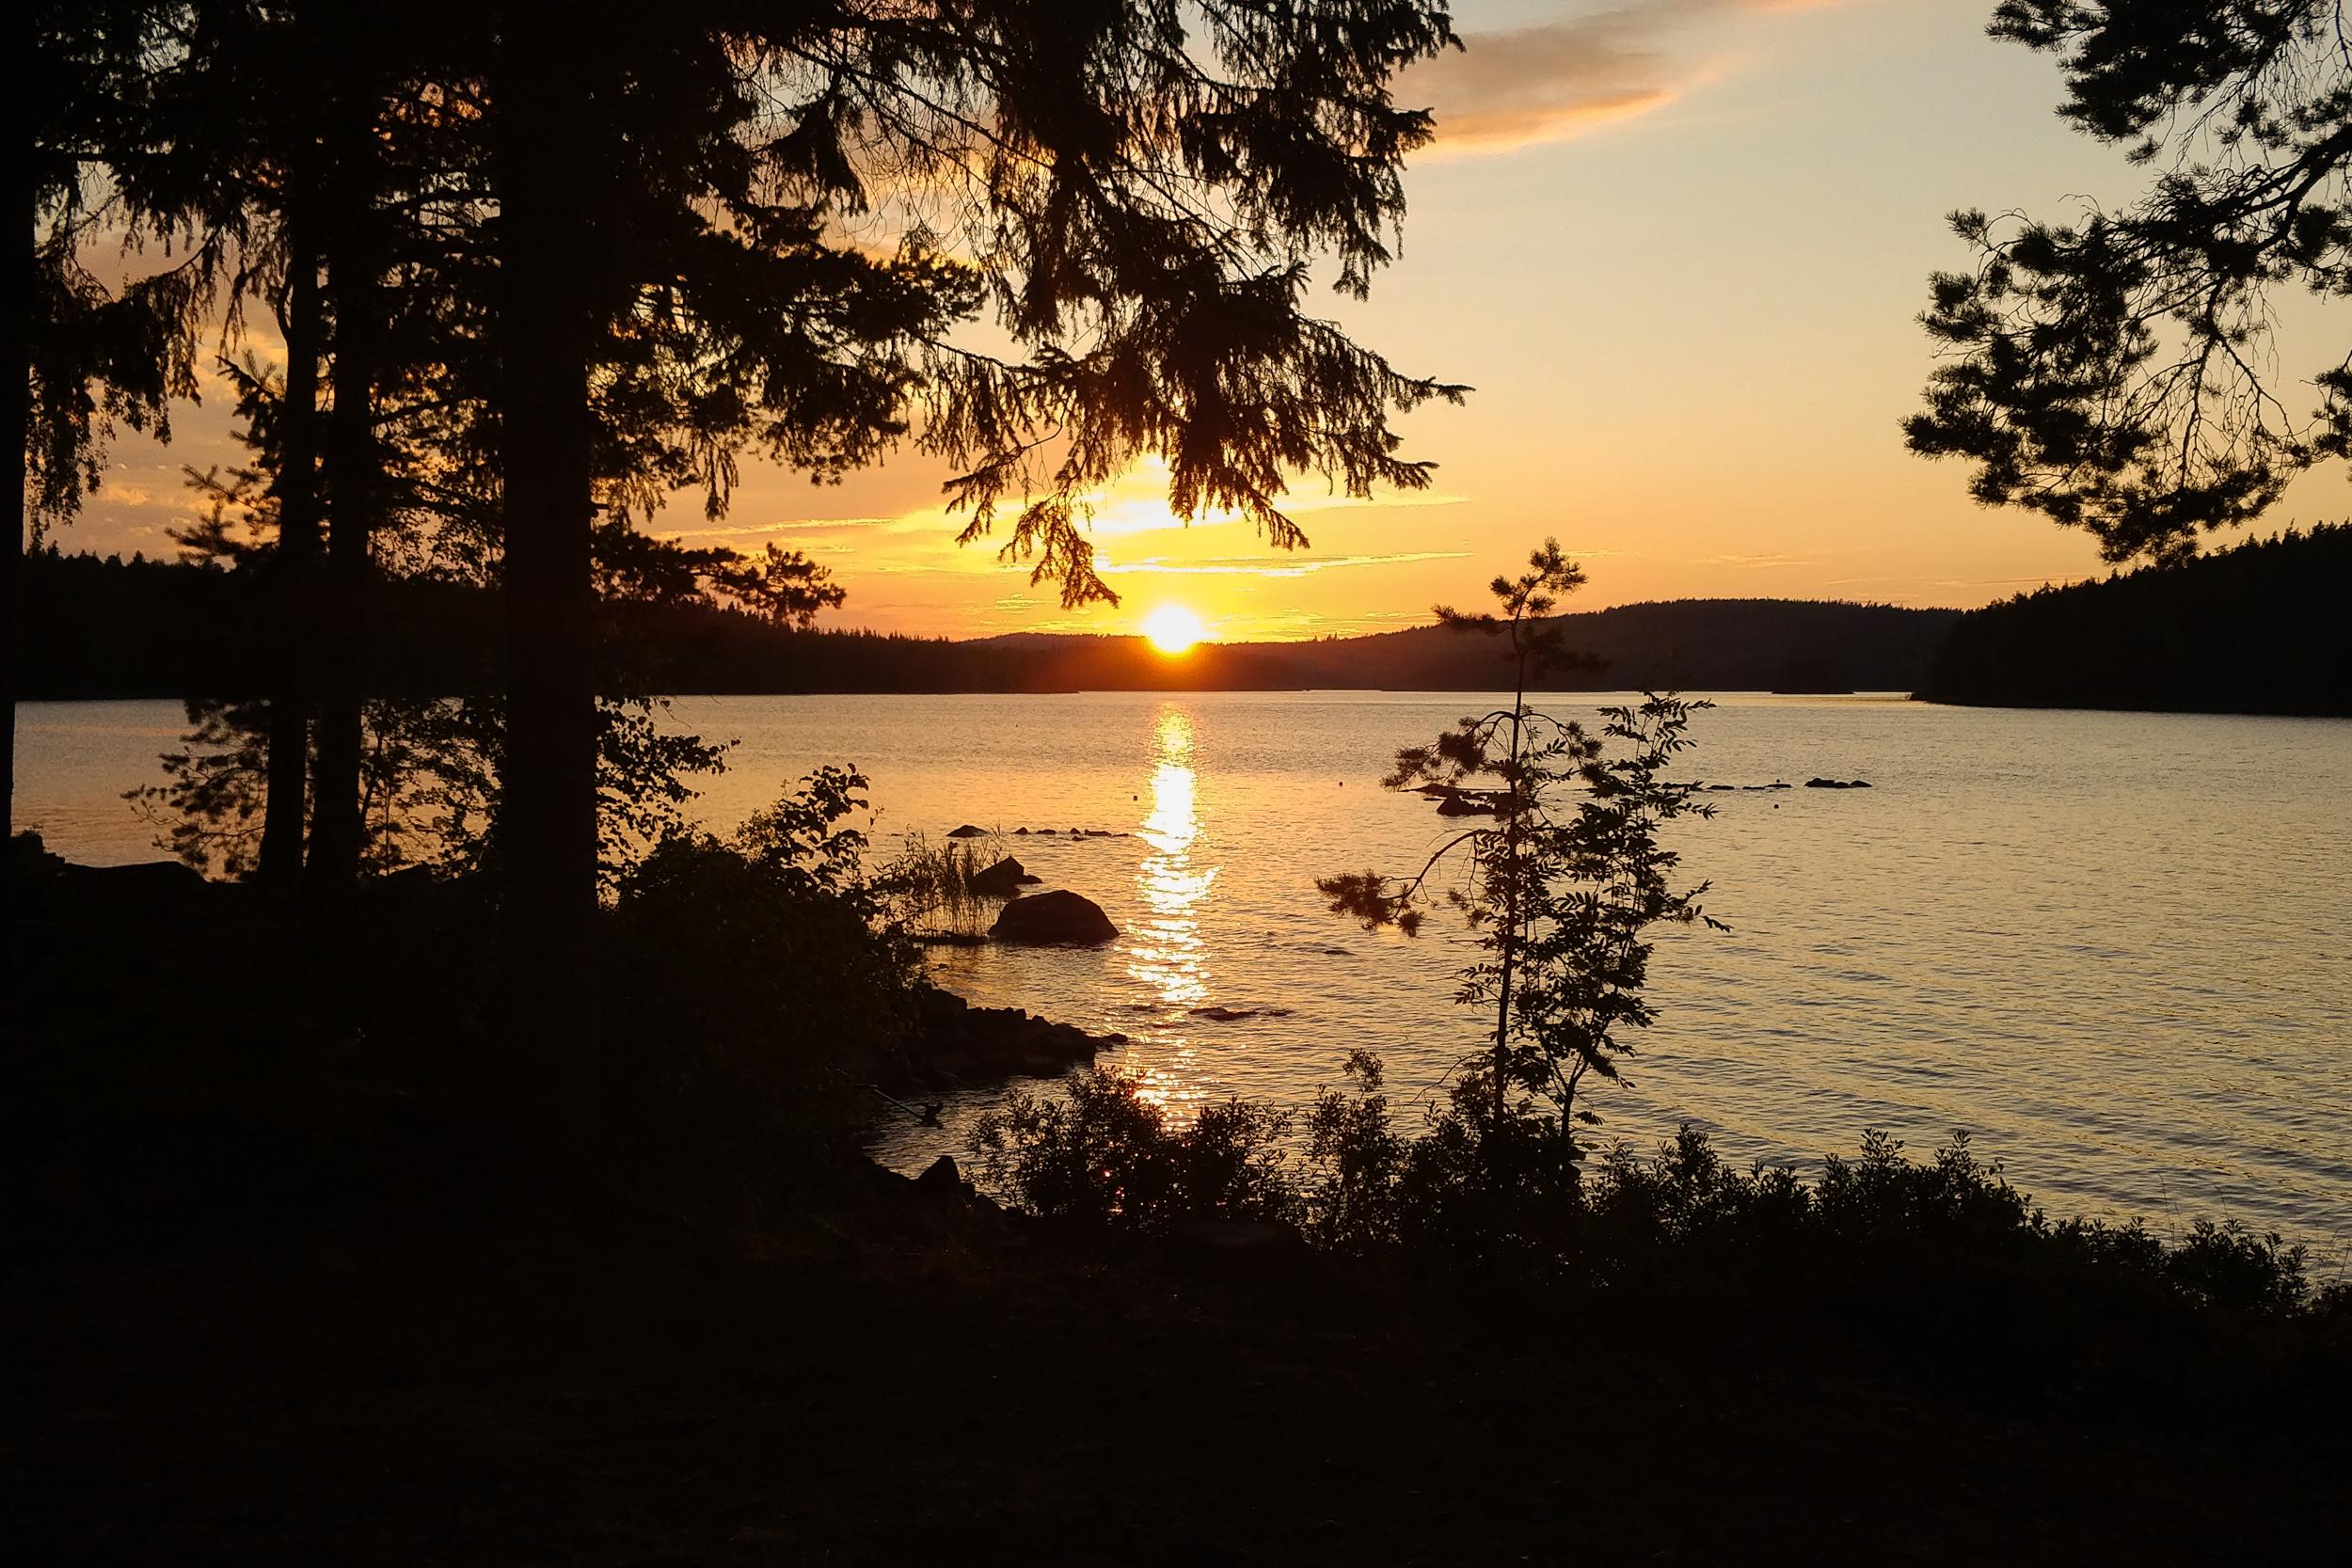 Solnedgång vid sjön